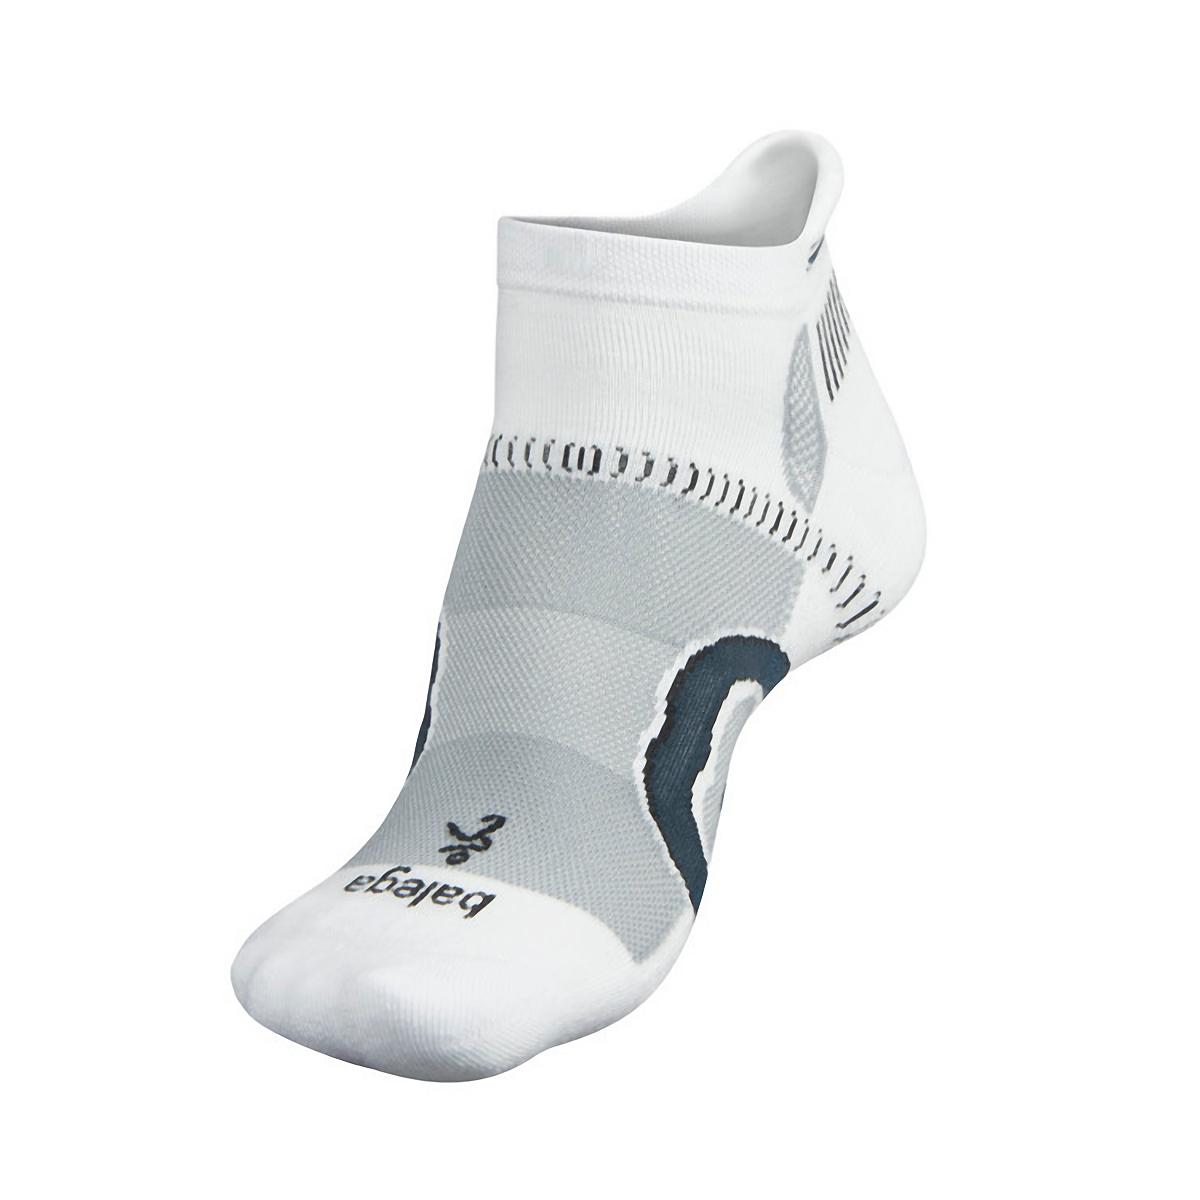 Balega Hidden Contour Socks - Color: White/Grey Size: S, White/Grey, large, image 2